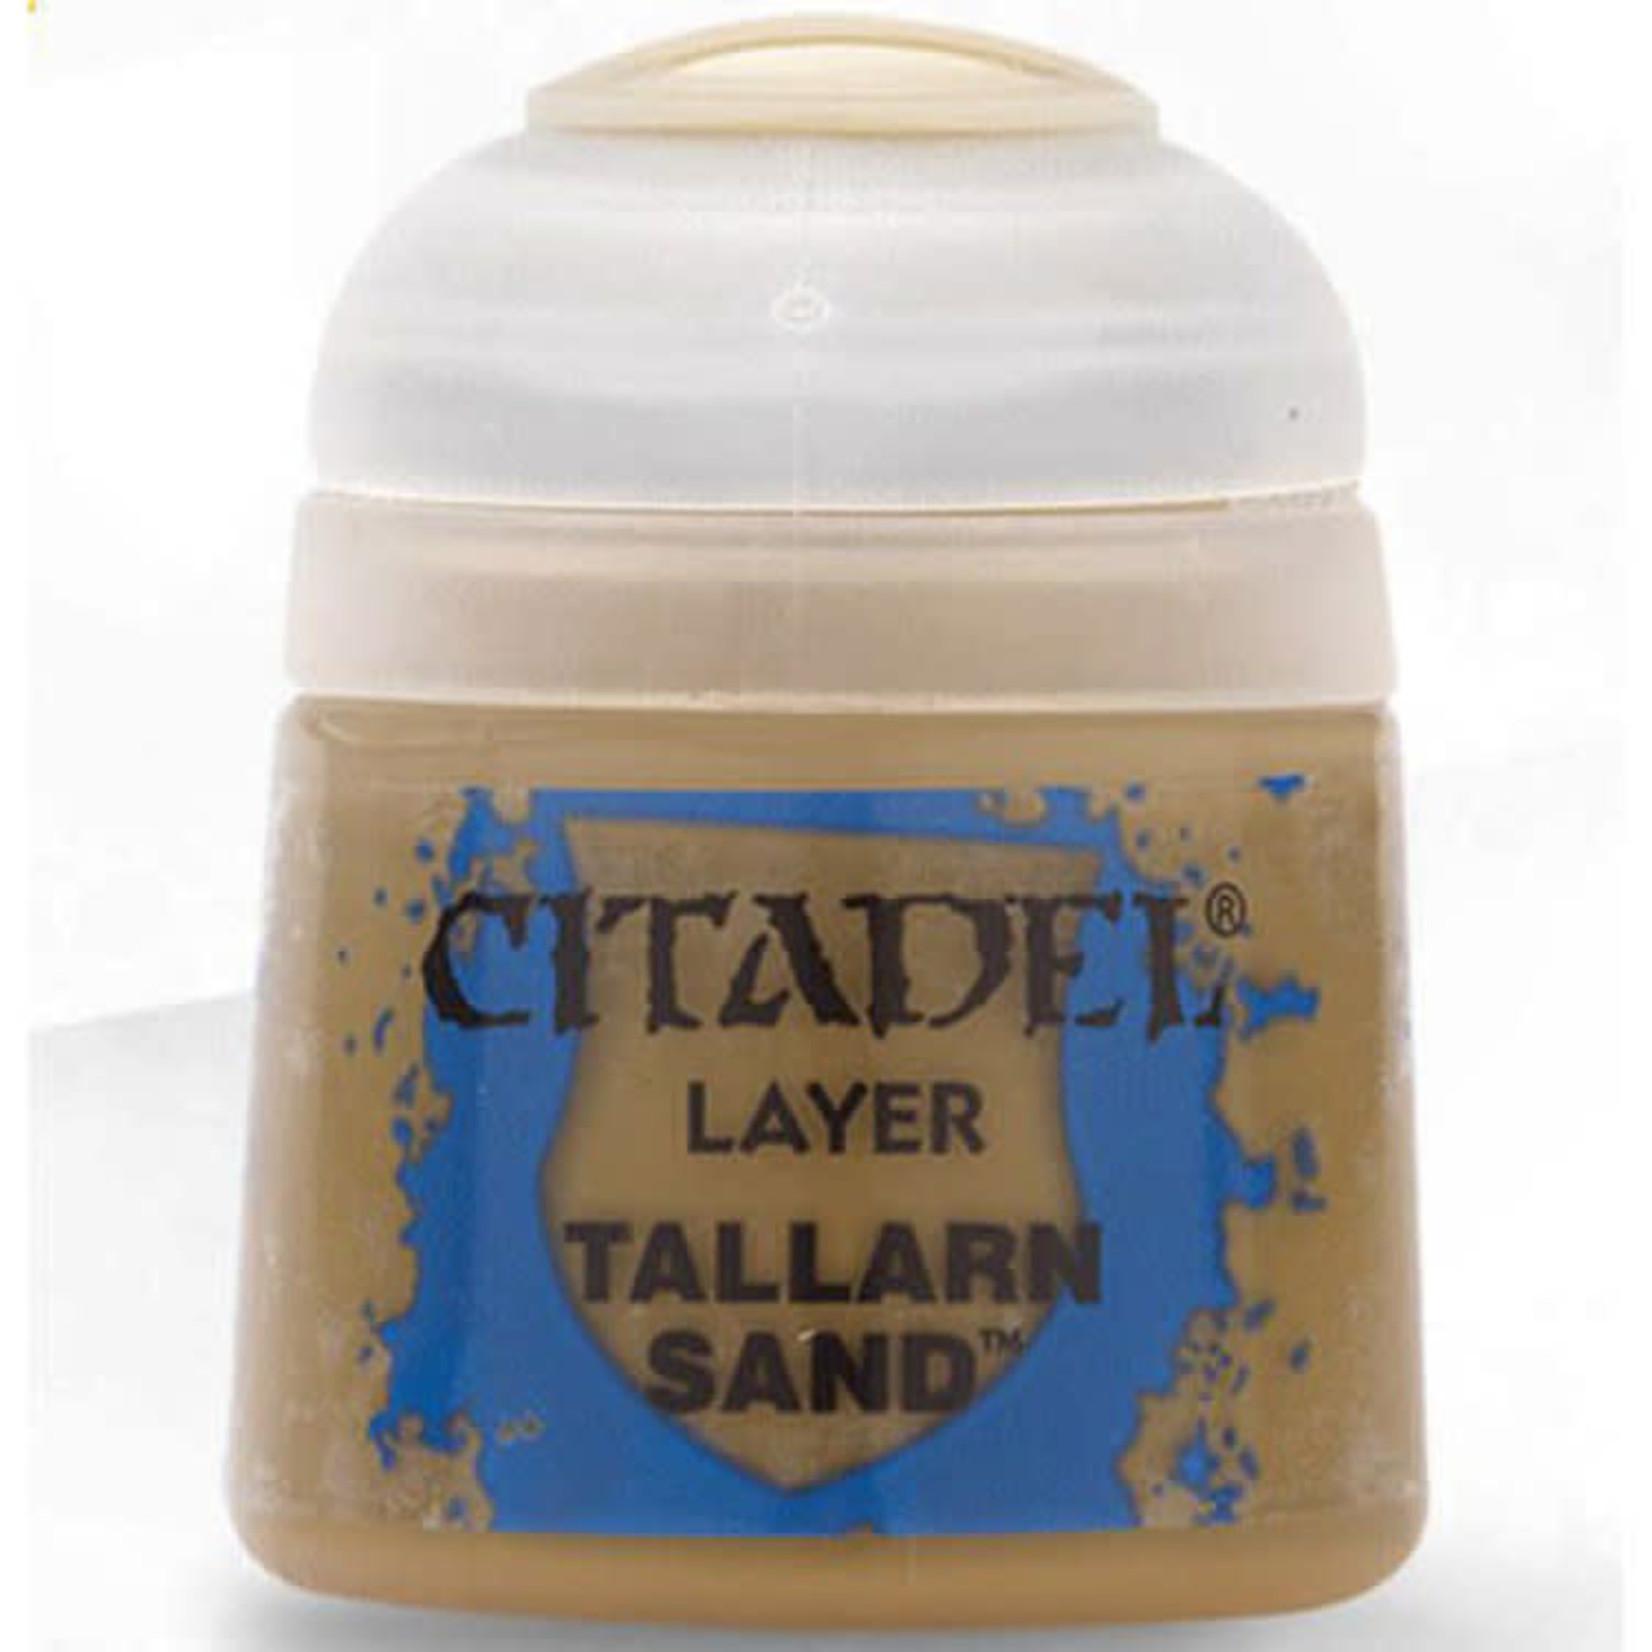 Games Workshop Citadel Paint: Tallarn Sand 12ml